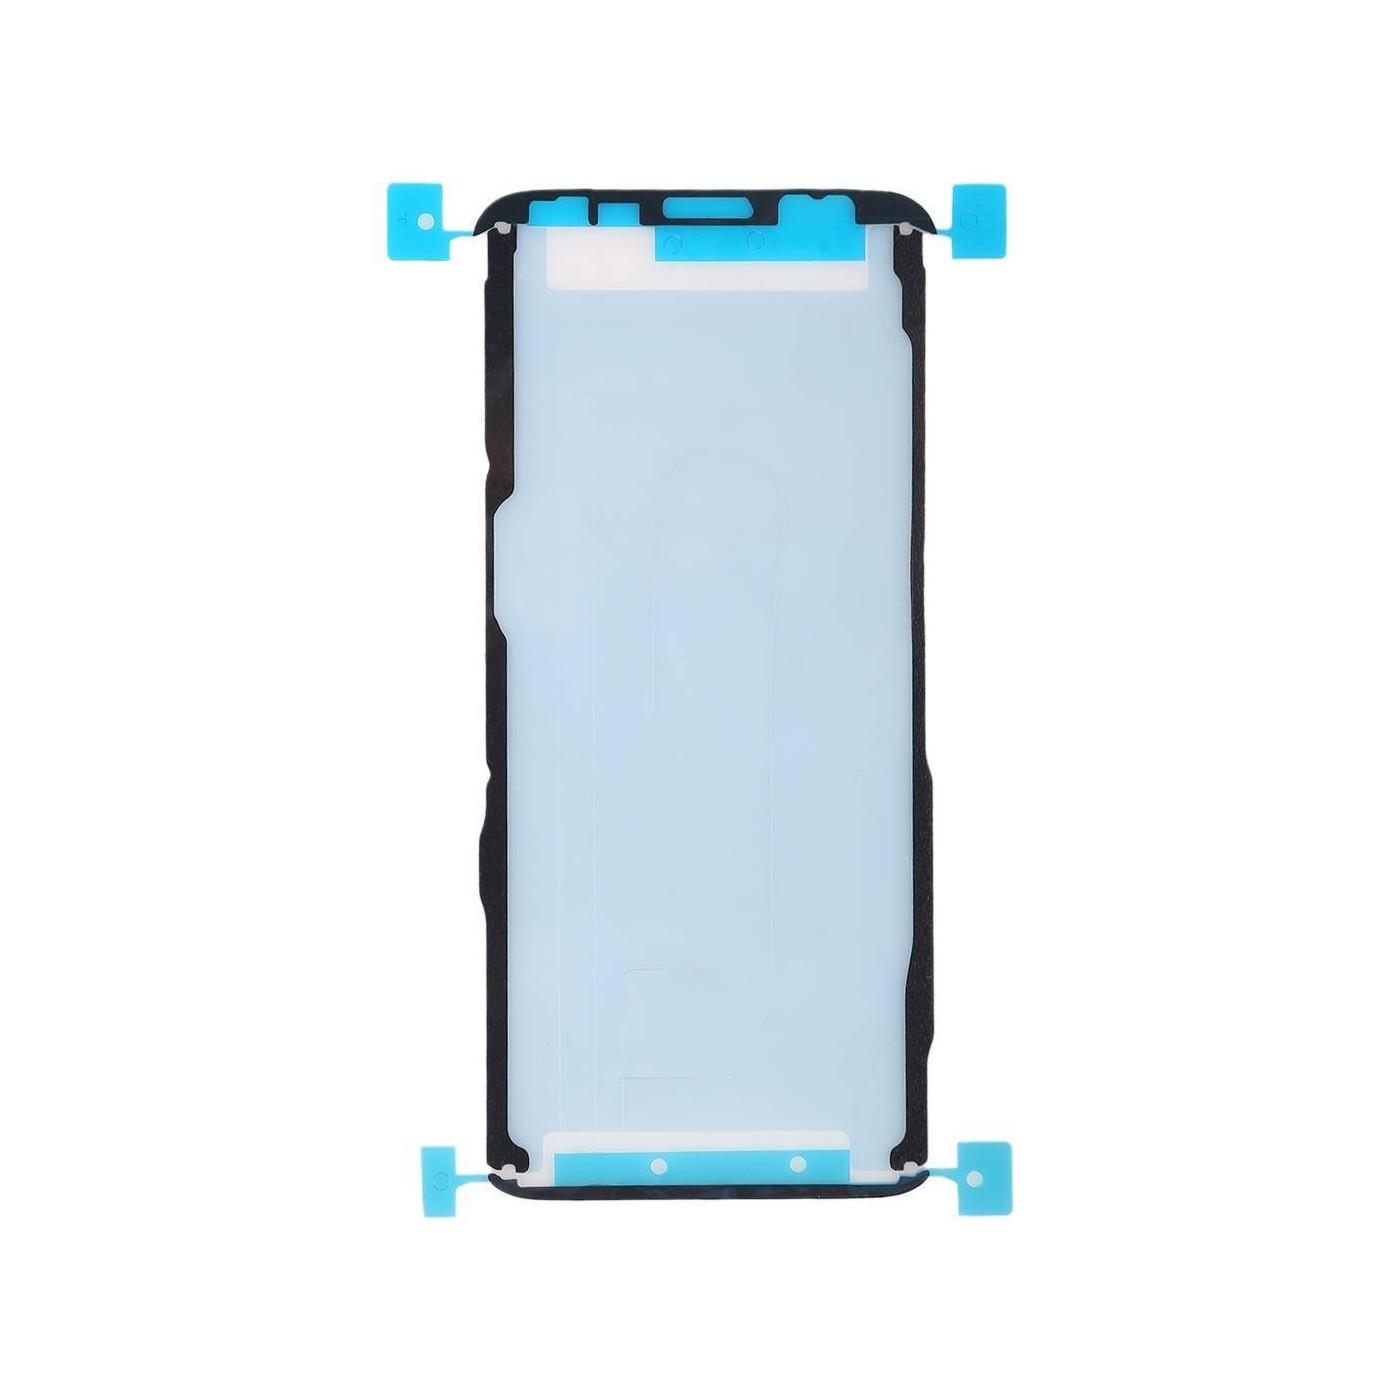 etiqueta frontal de doble cara para Samsung Galaxy S9 G960F